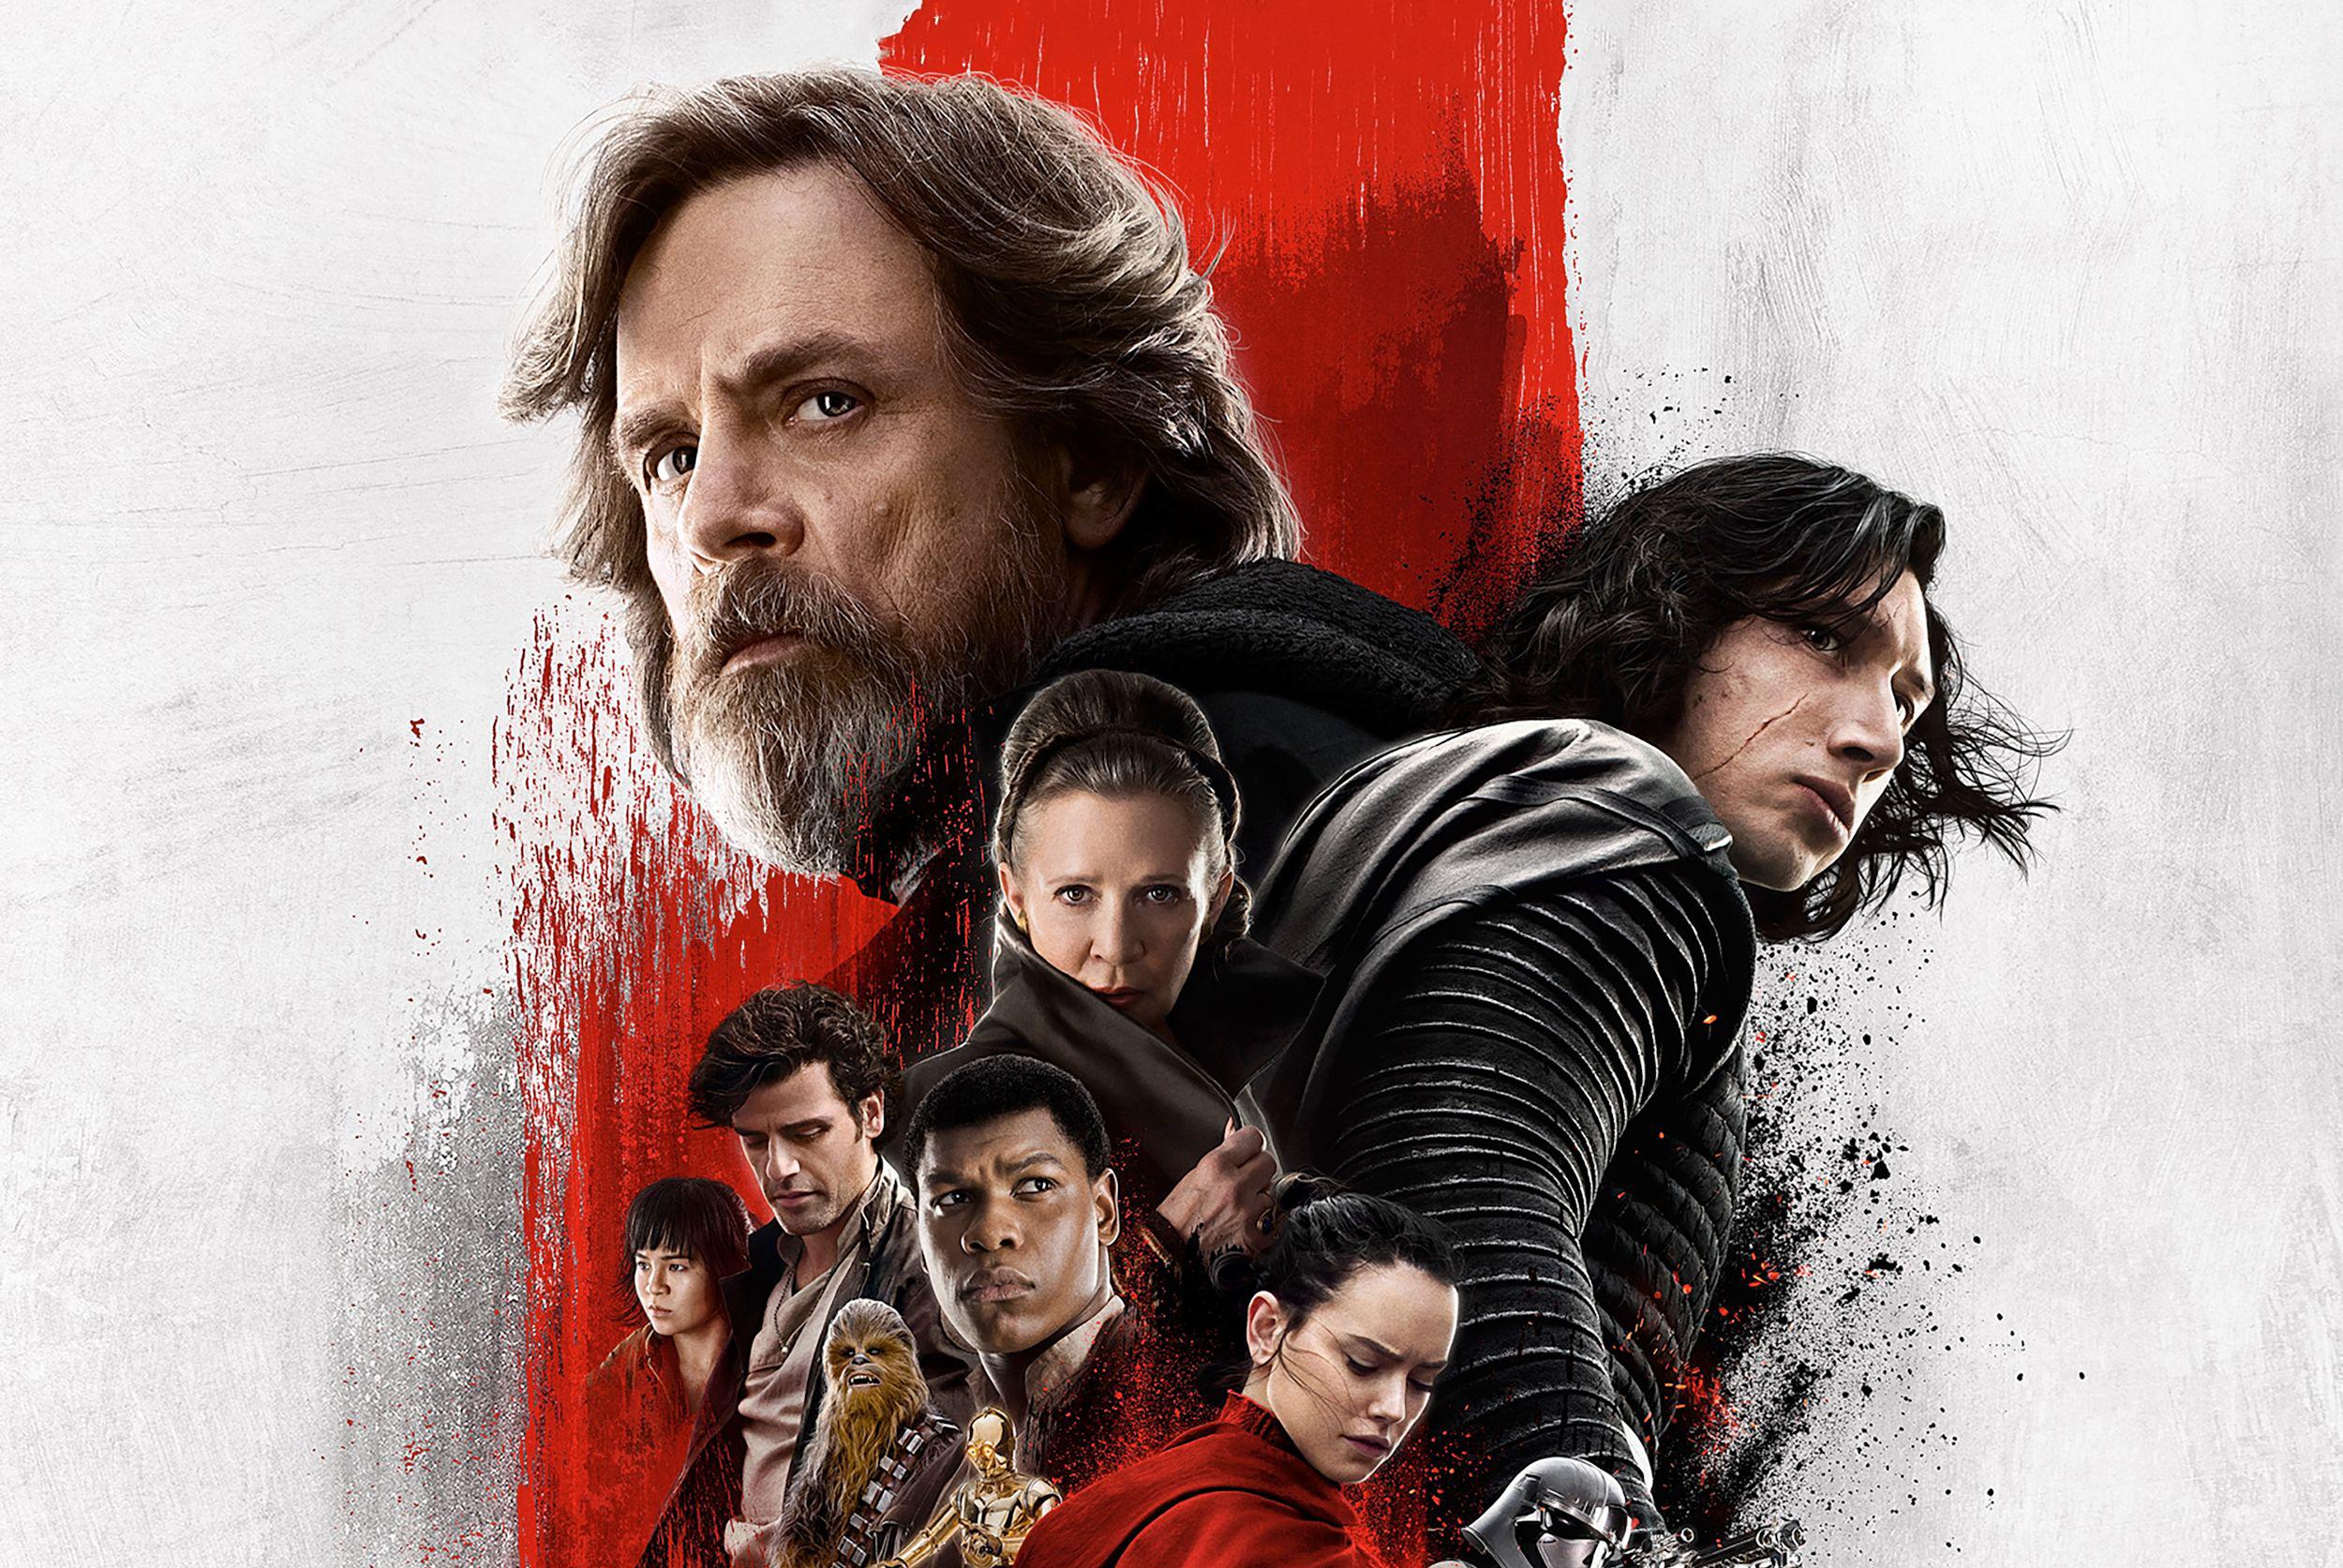 The Last Jedi Wallpaper Leaked Episode Ix Poster 373820 Hd